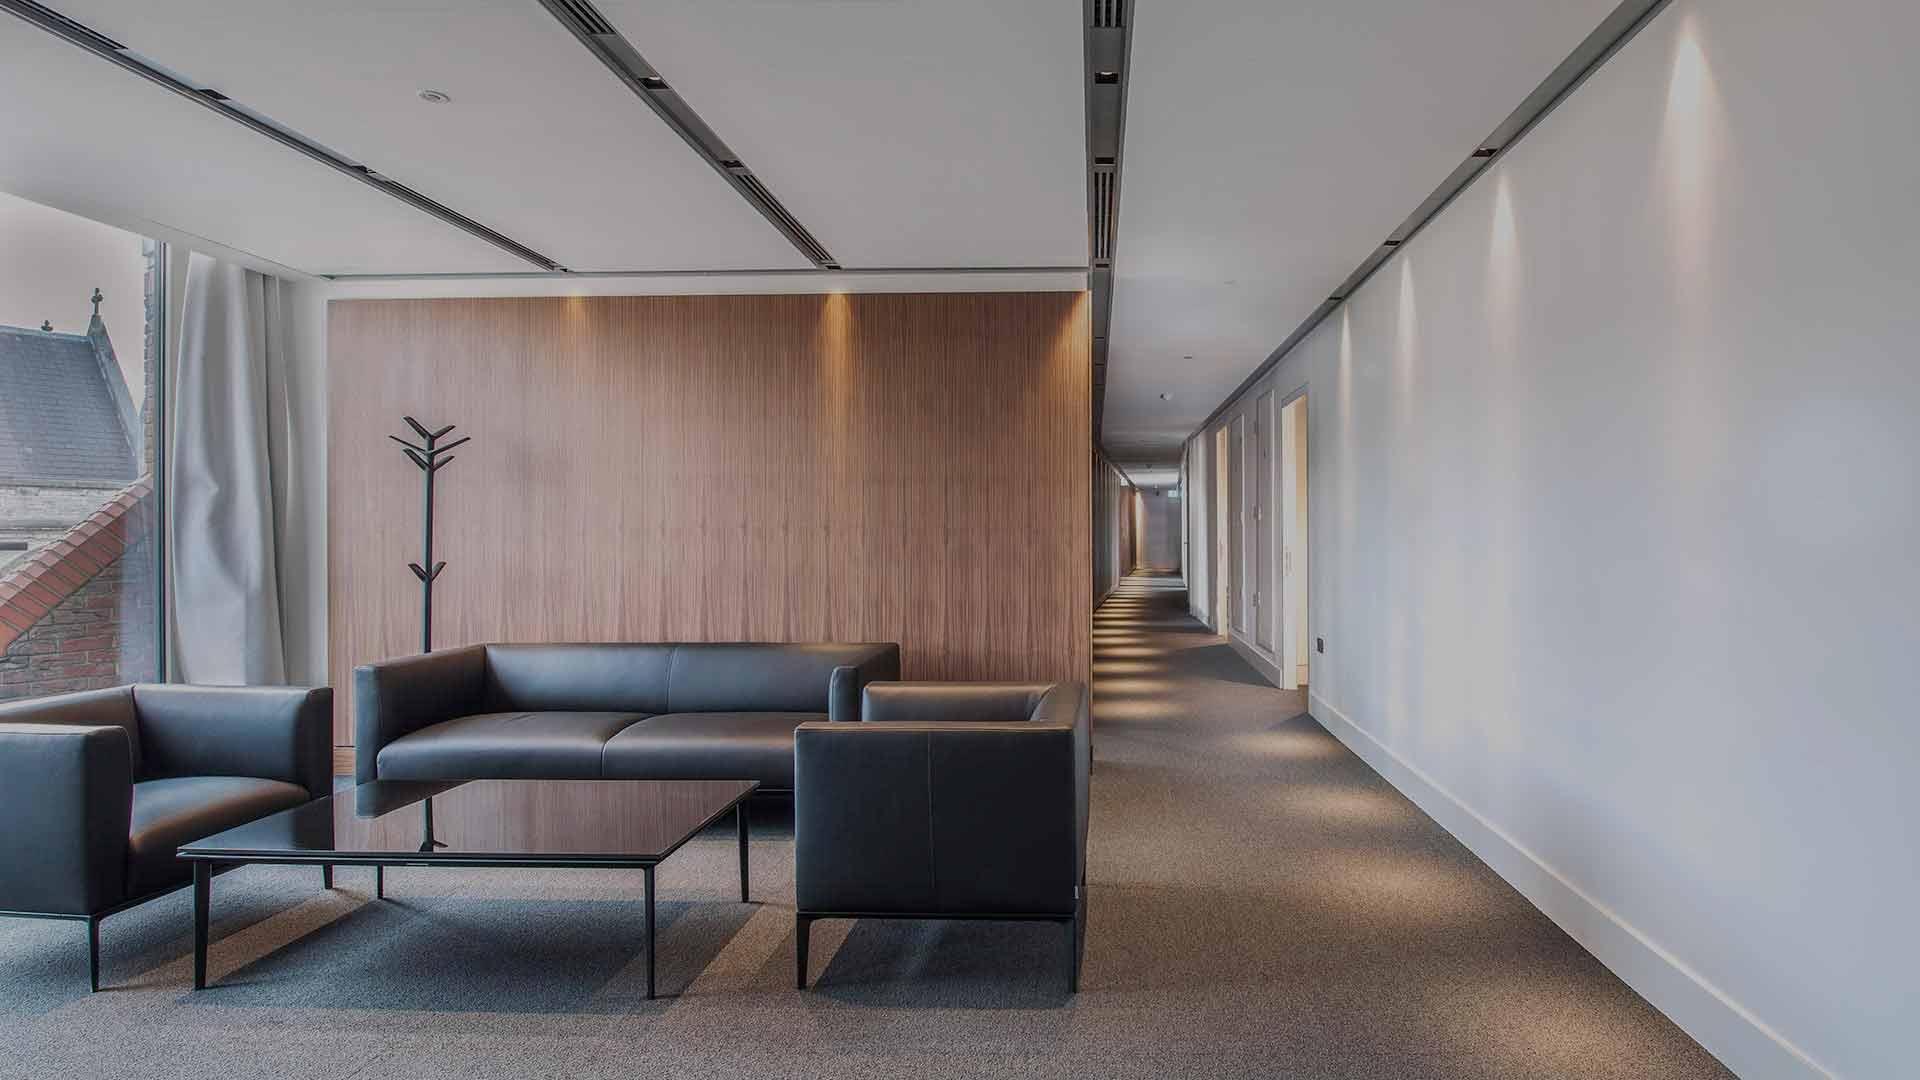 International-Bank-London-Bulb-Interiors-header